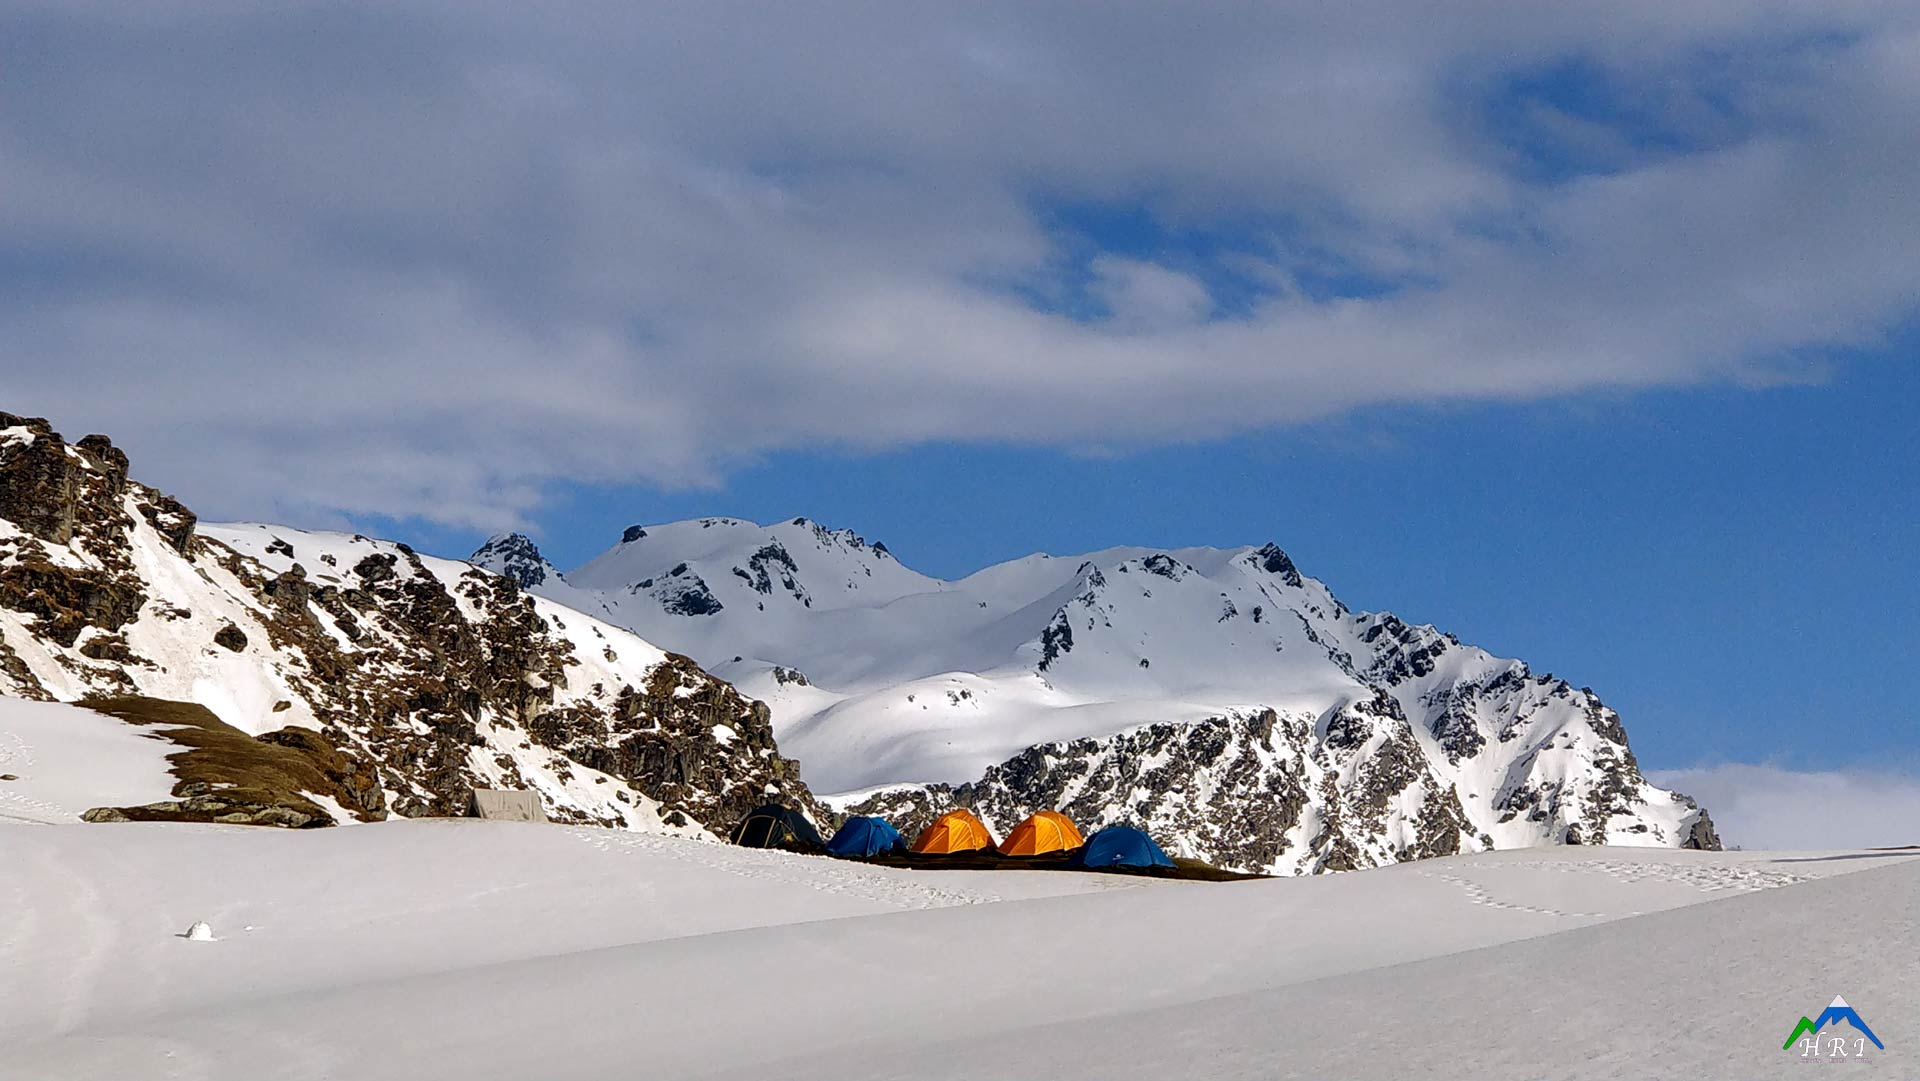 Day 4: Min Thach to Nagaru (Trek 8kms, 5 hrs)